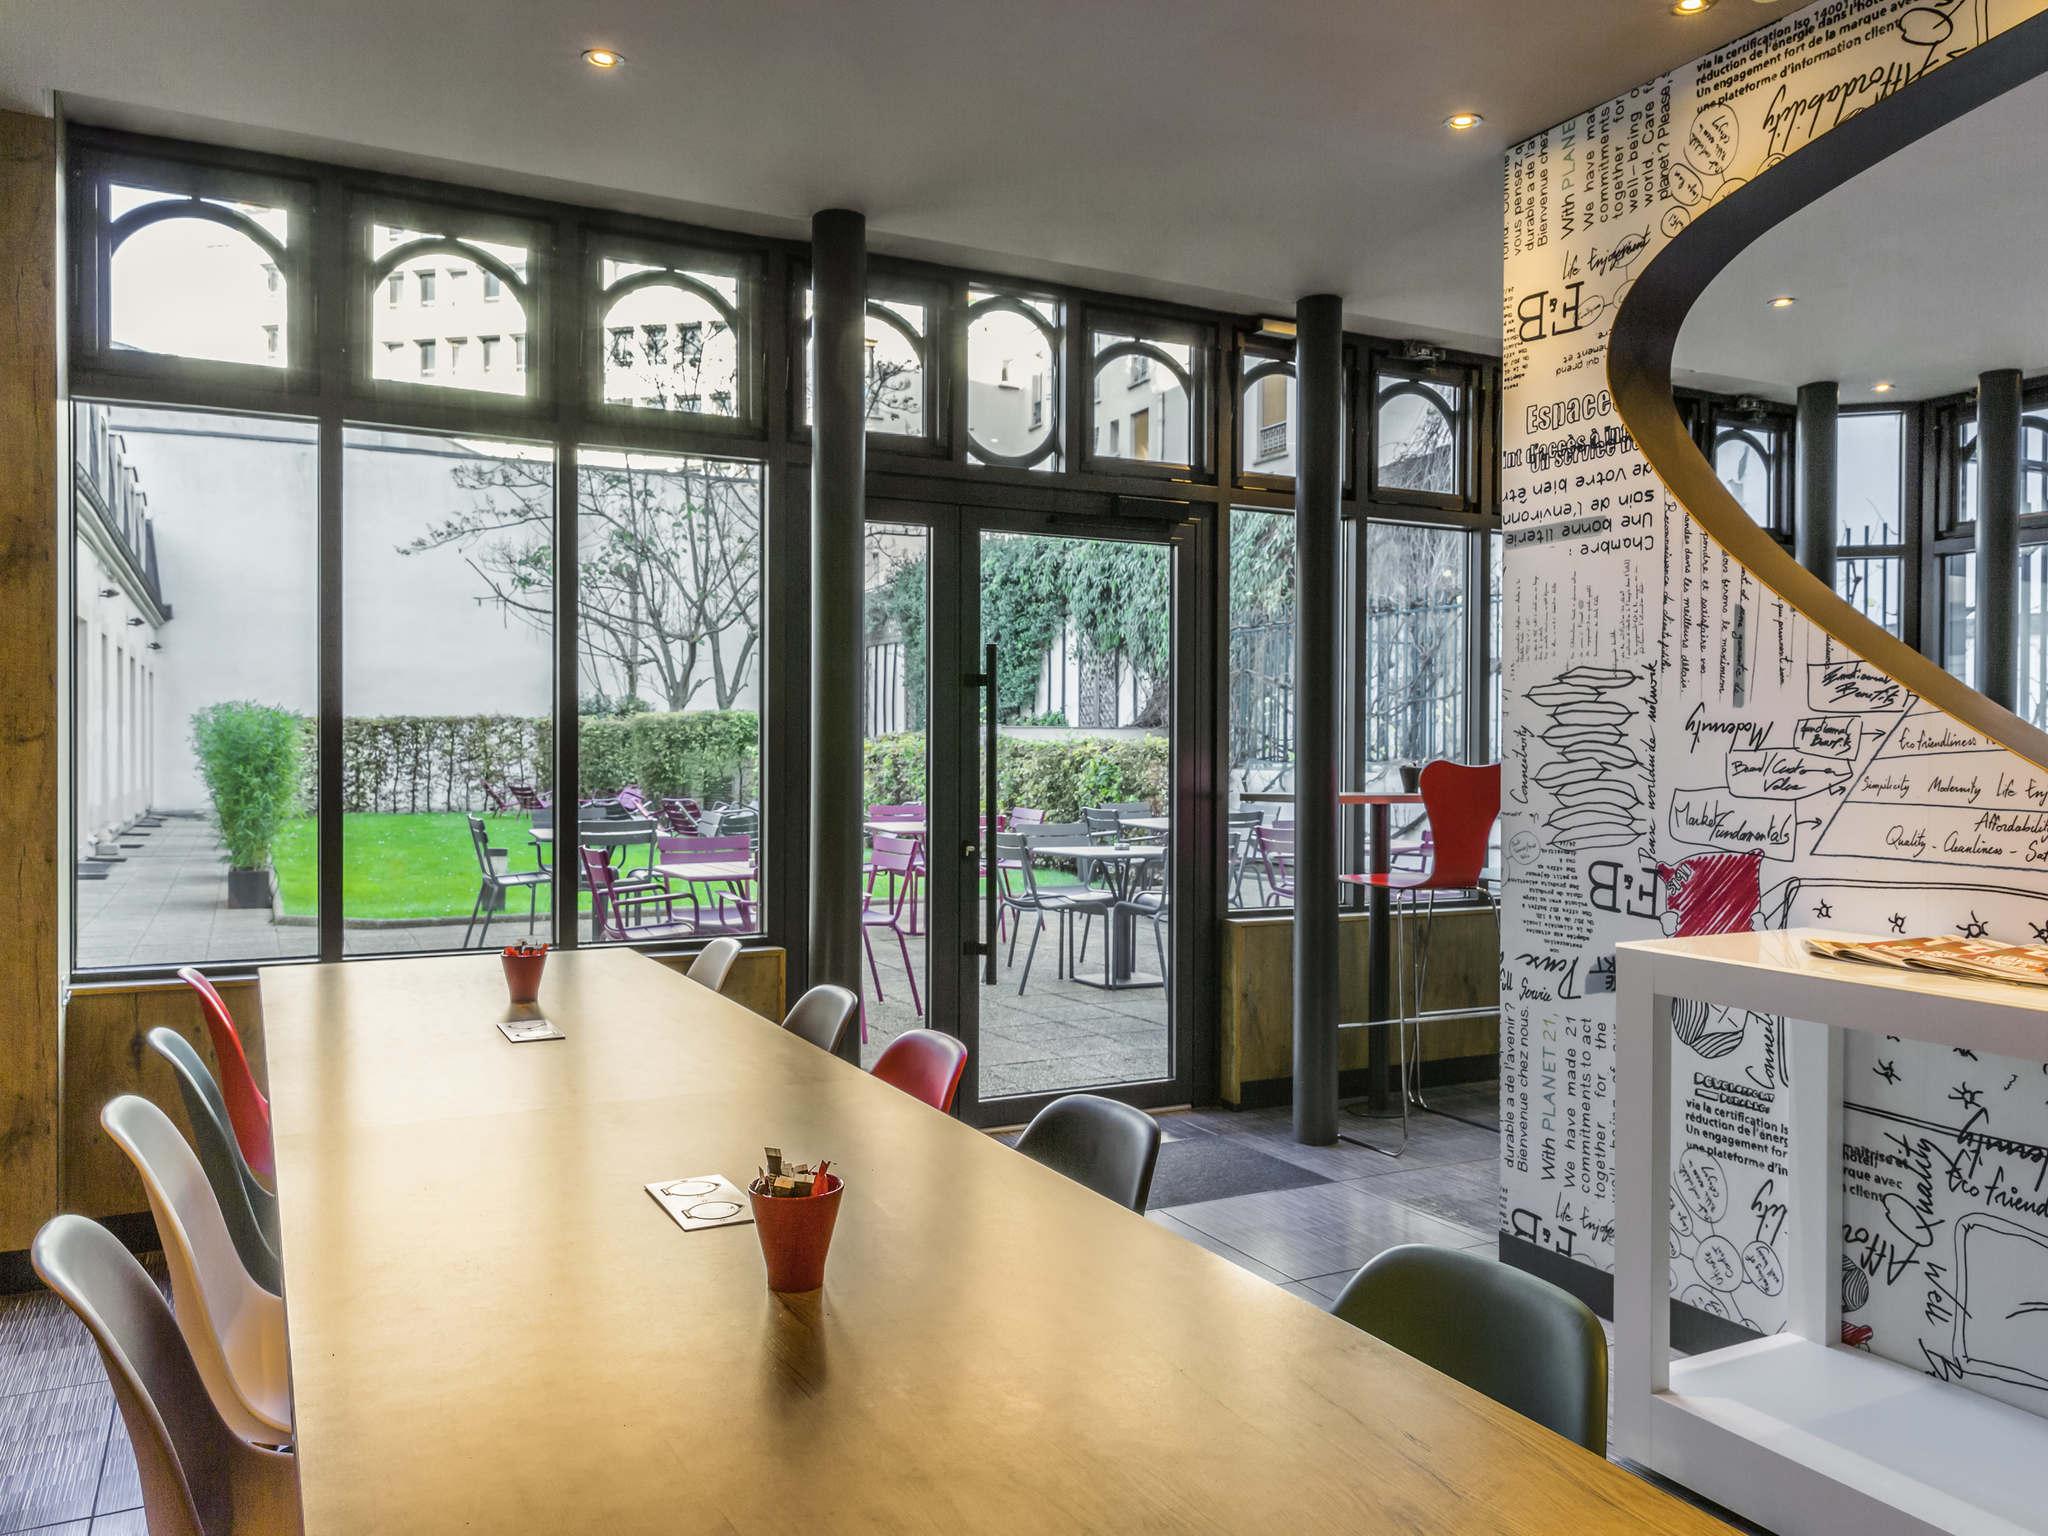 Novotel Paris Gare De Lyon: 2019 Room Prices $172, Deals ...